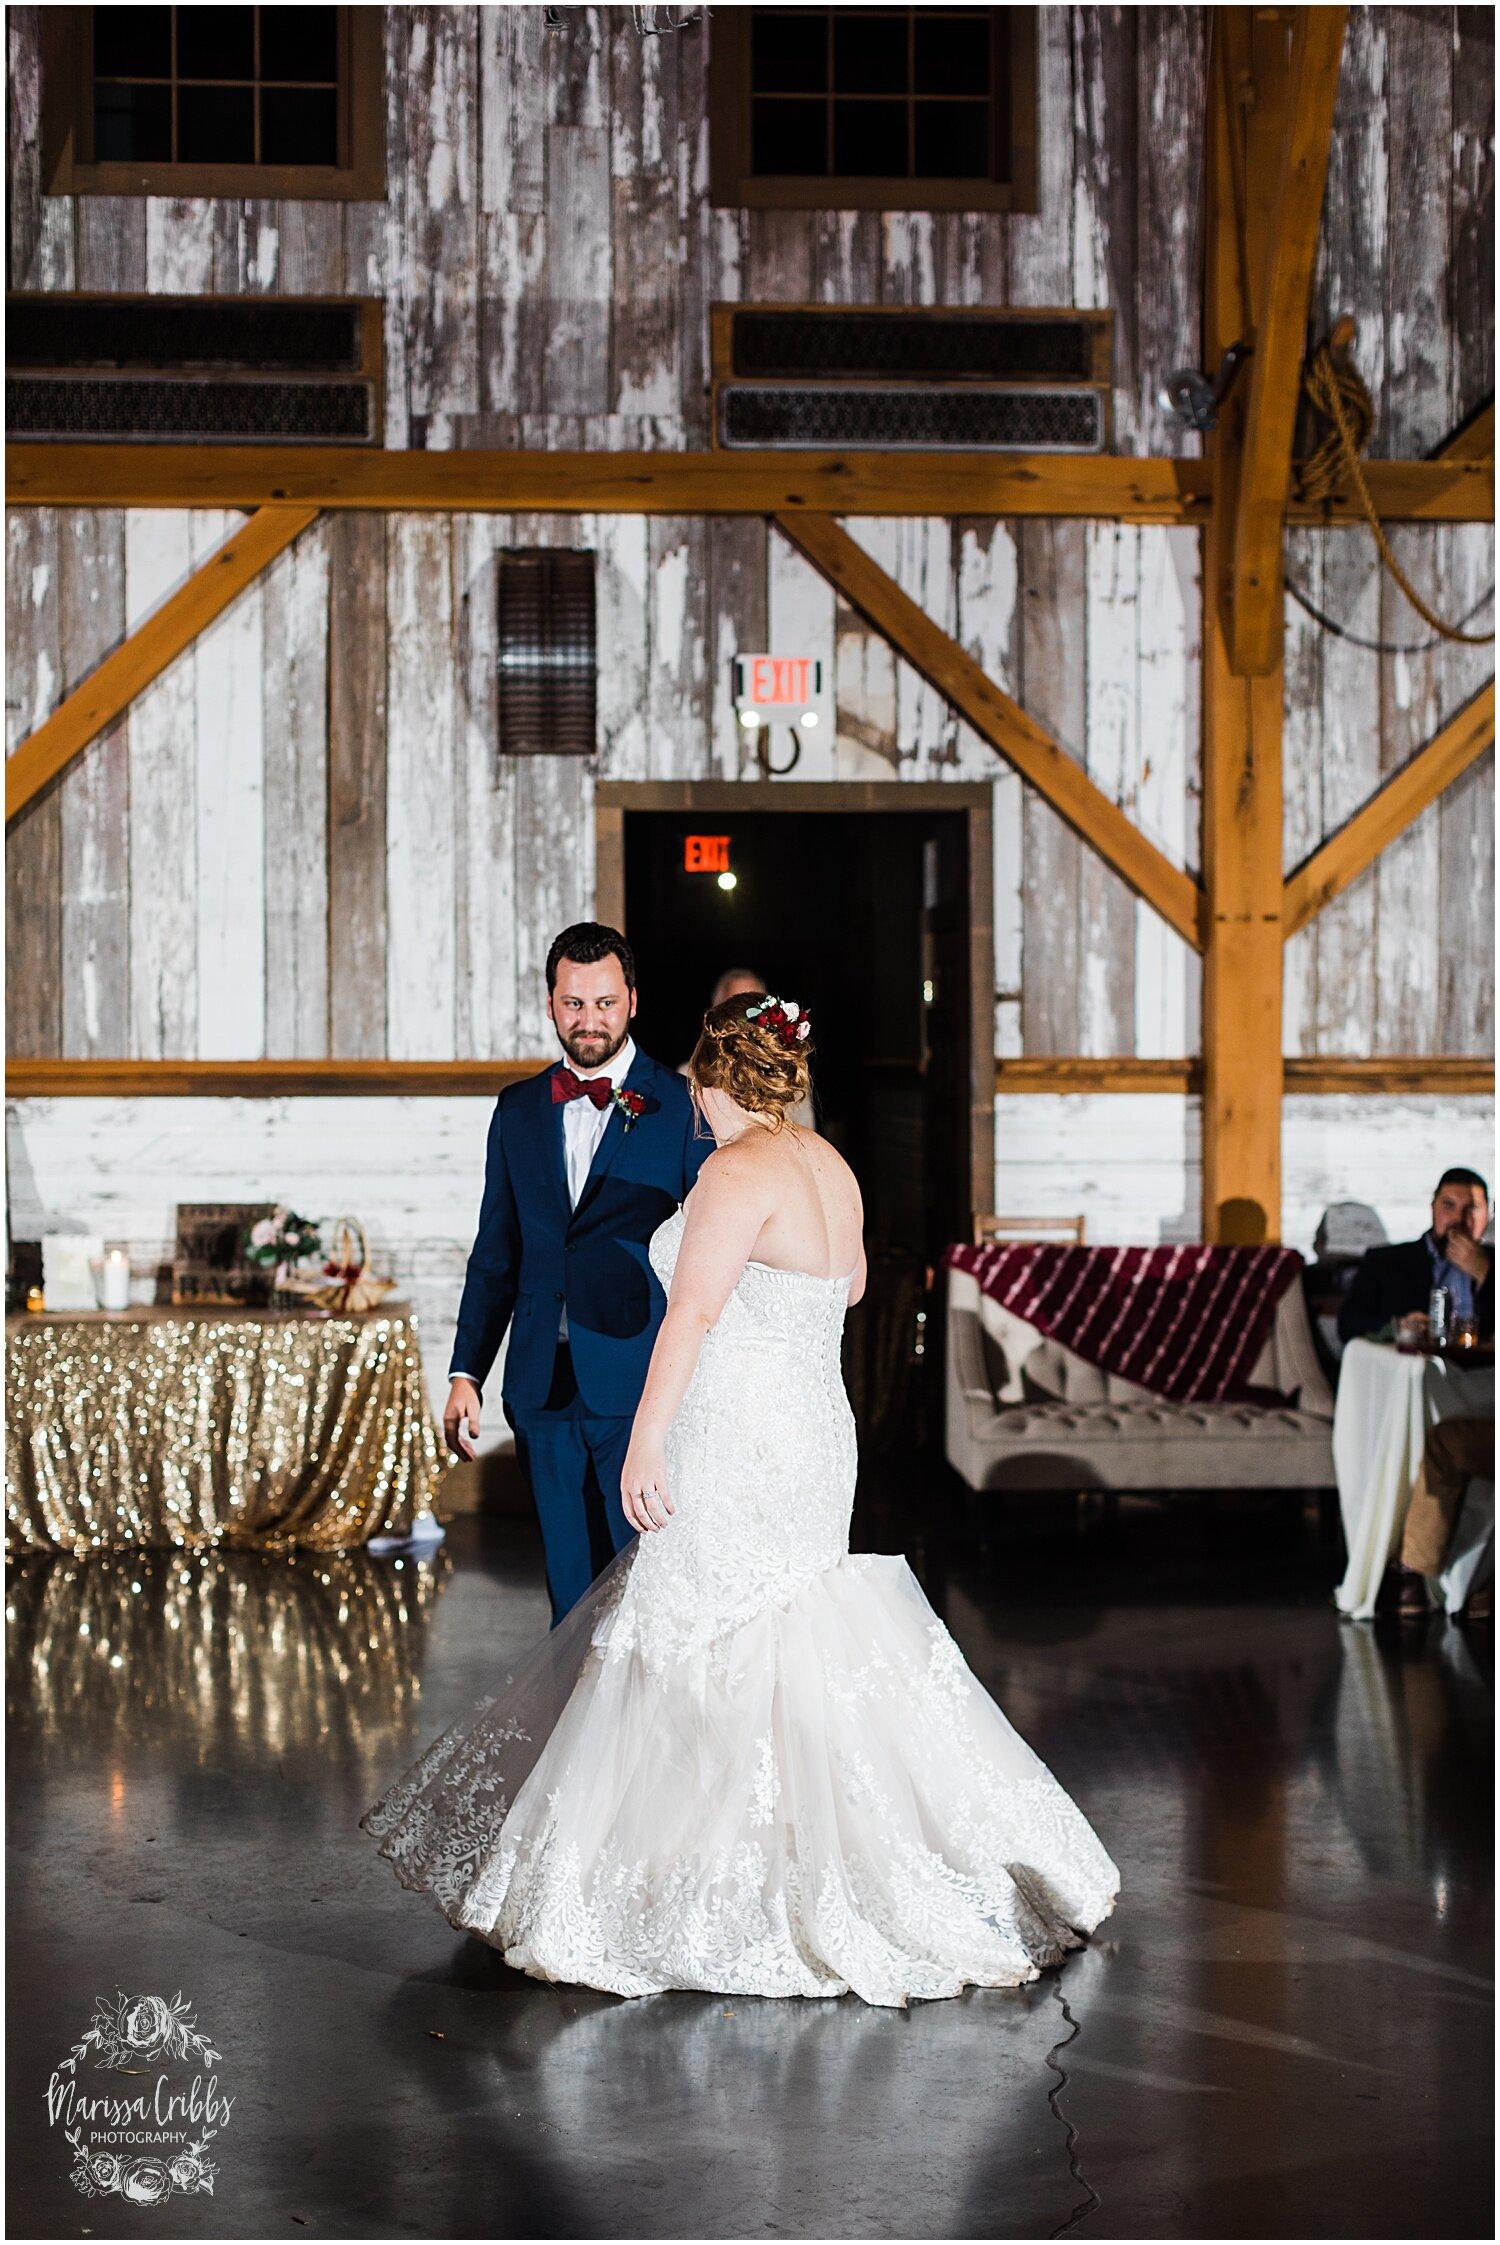 ANNA & LUKE MARRIED BLOG | MARISSA CRIBBS PHOTOGRAPHY | WESTON RED BARN FARM_9474.jpg